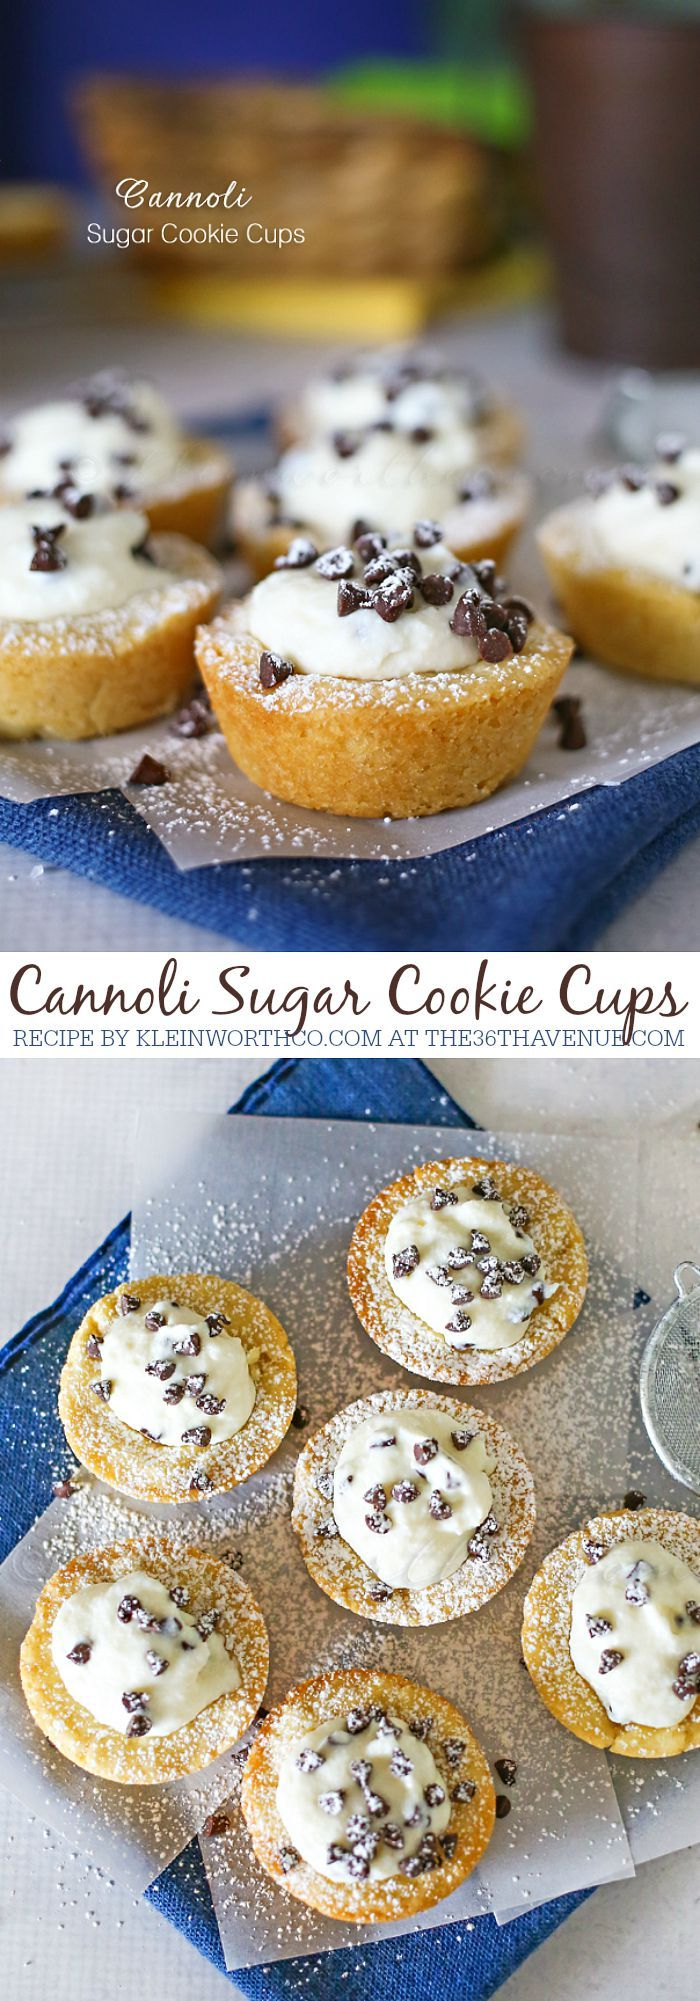 Cannoli Sugar Cookie Cups at the36thavenue.com #dessert #recipes #easy #sweet #recipe